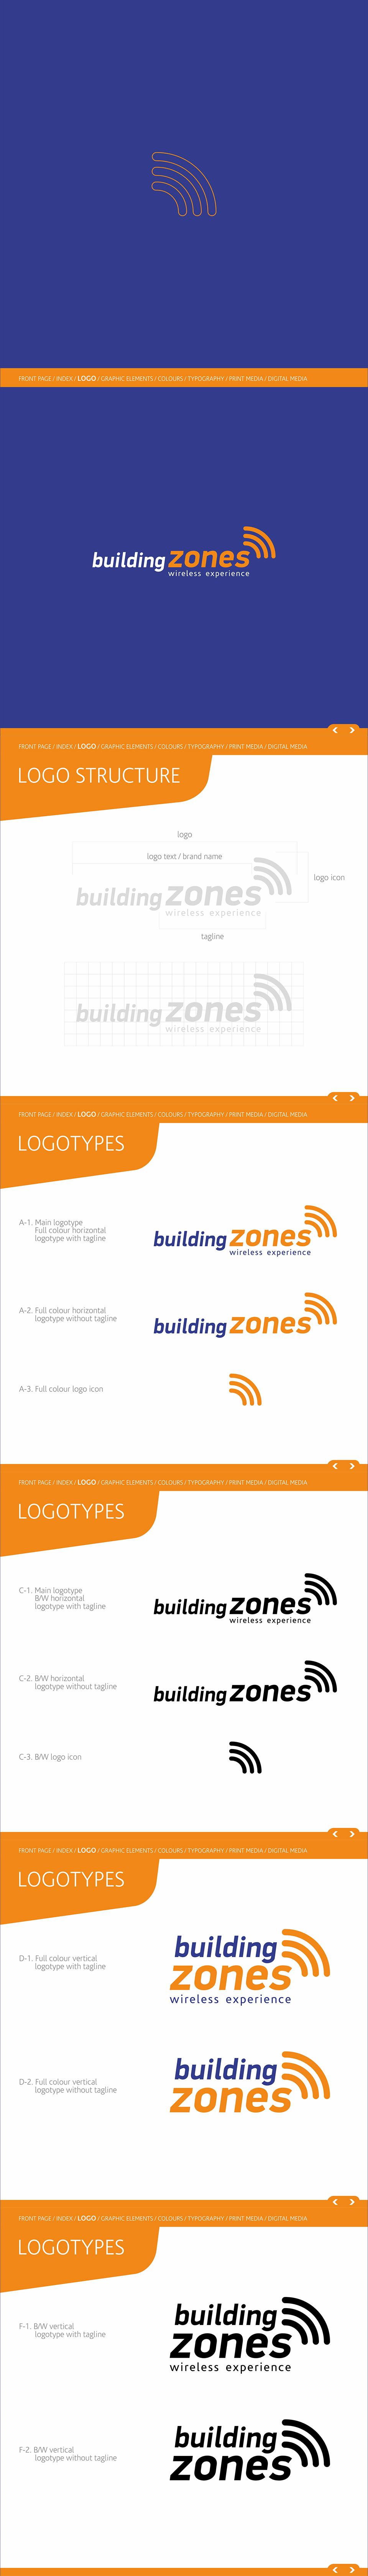 BuildingZones-cvi-1